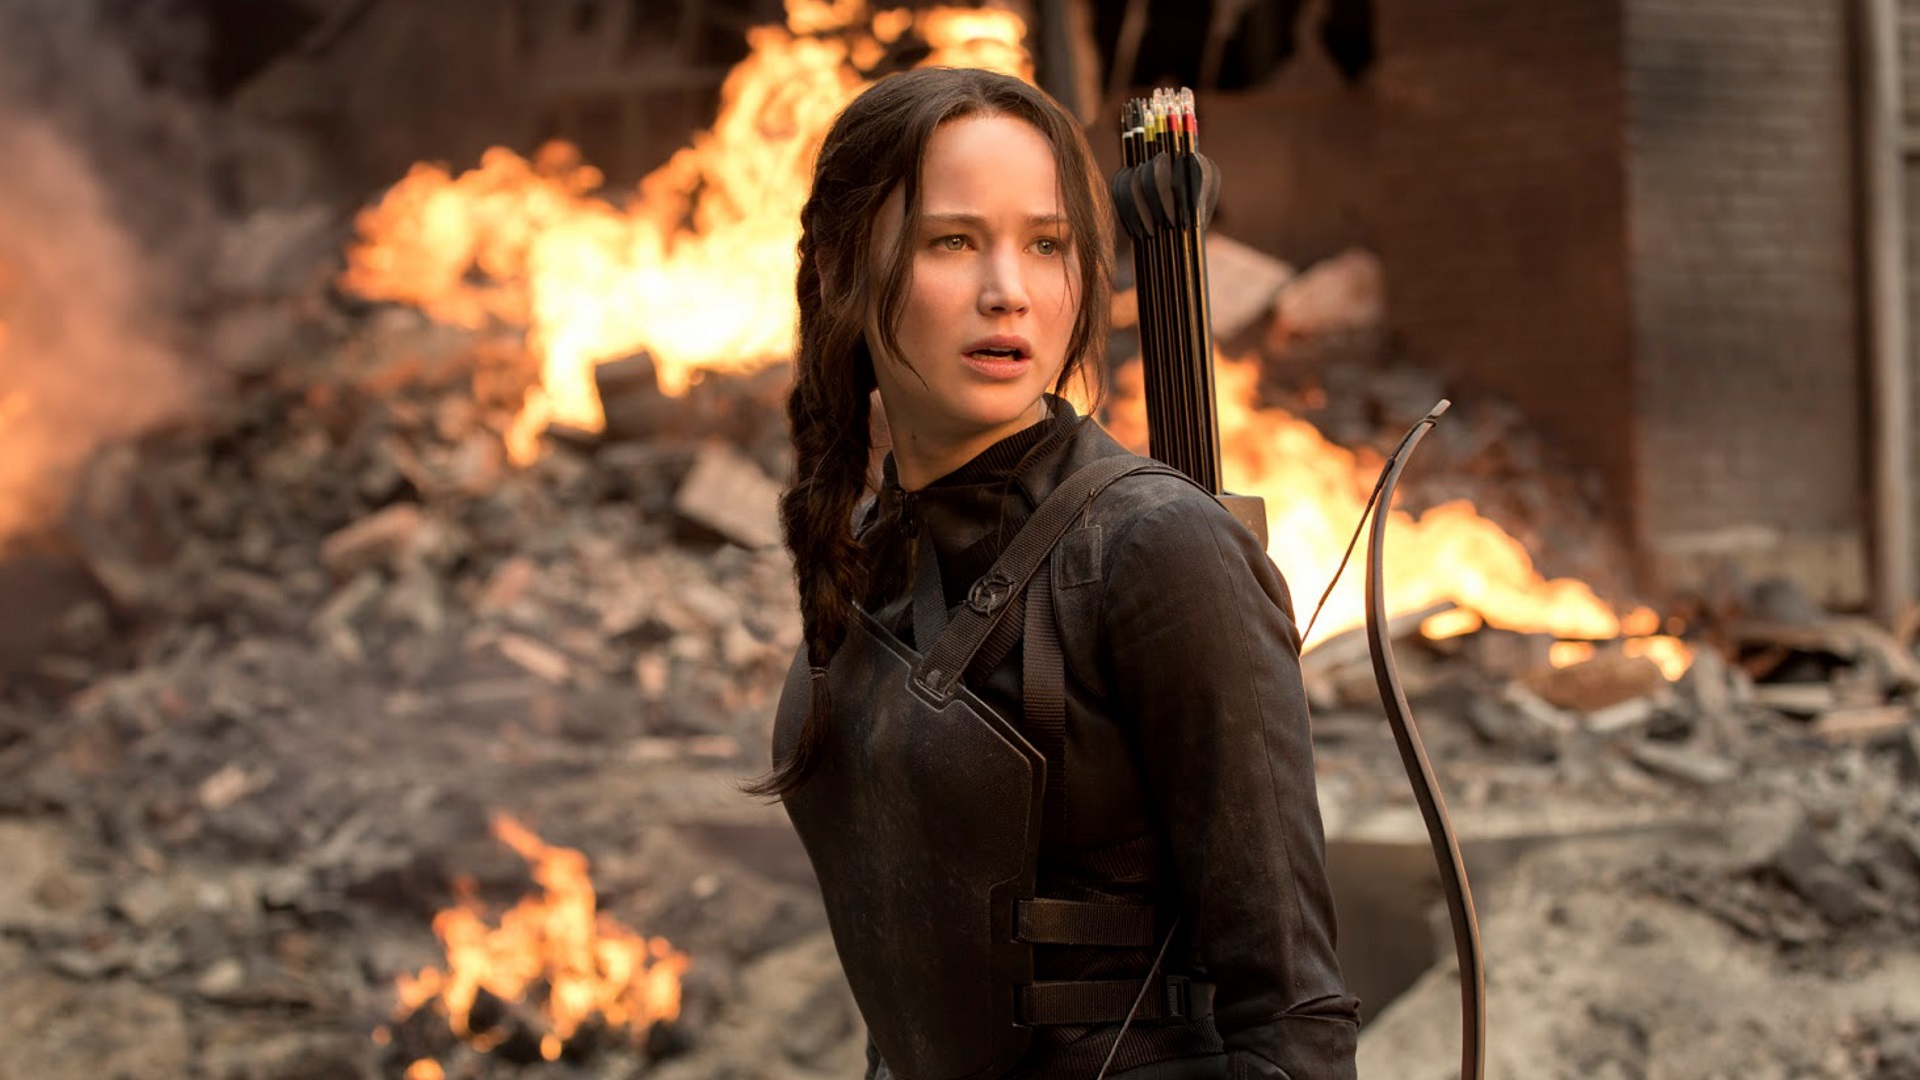 """The Hunger Games: Mockingjay - Part 1"" (2014)- Movie Review - Matt Marshall - We Live Film"